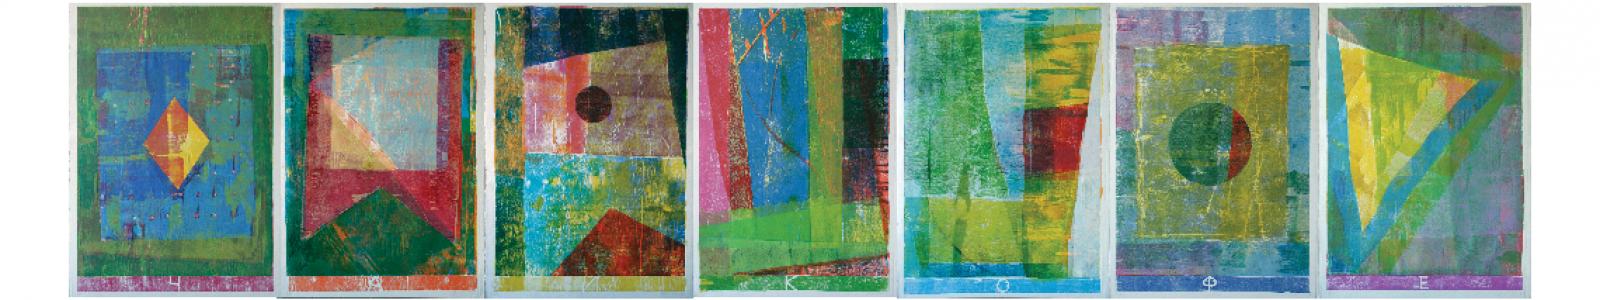 Gallery Painter Alexey Orlovski